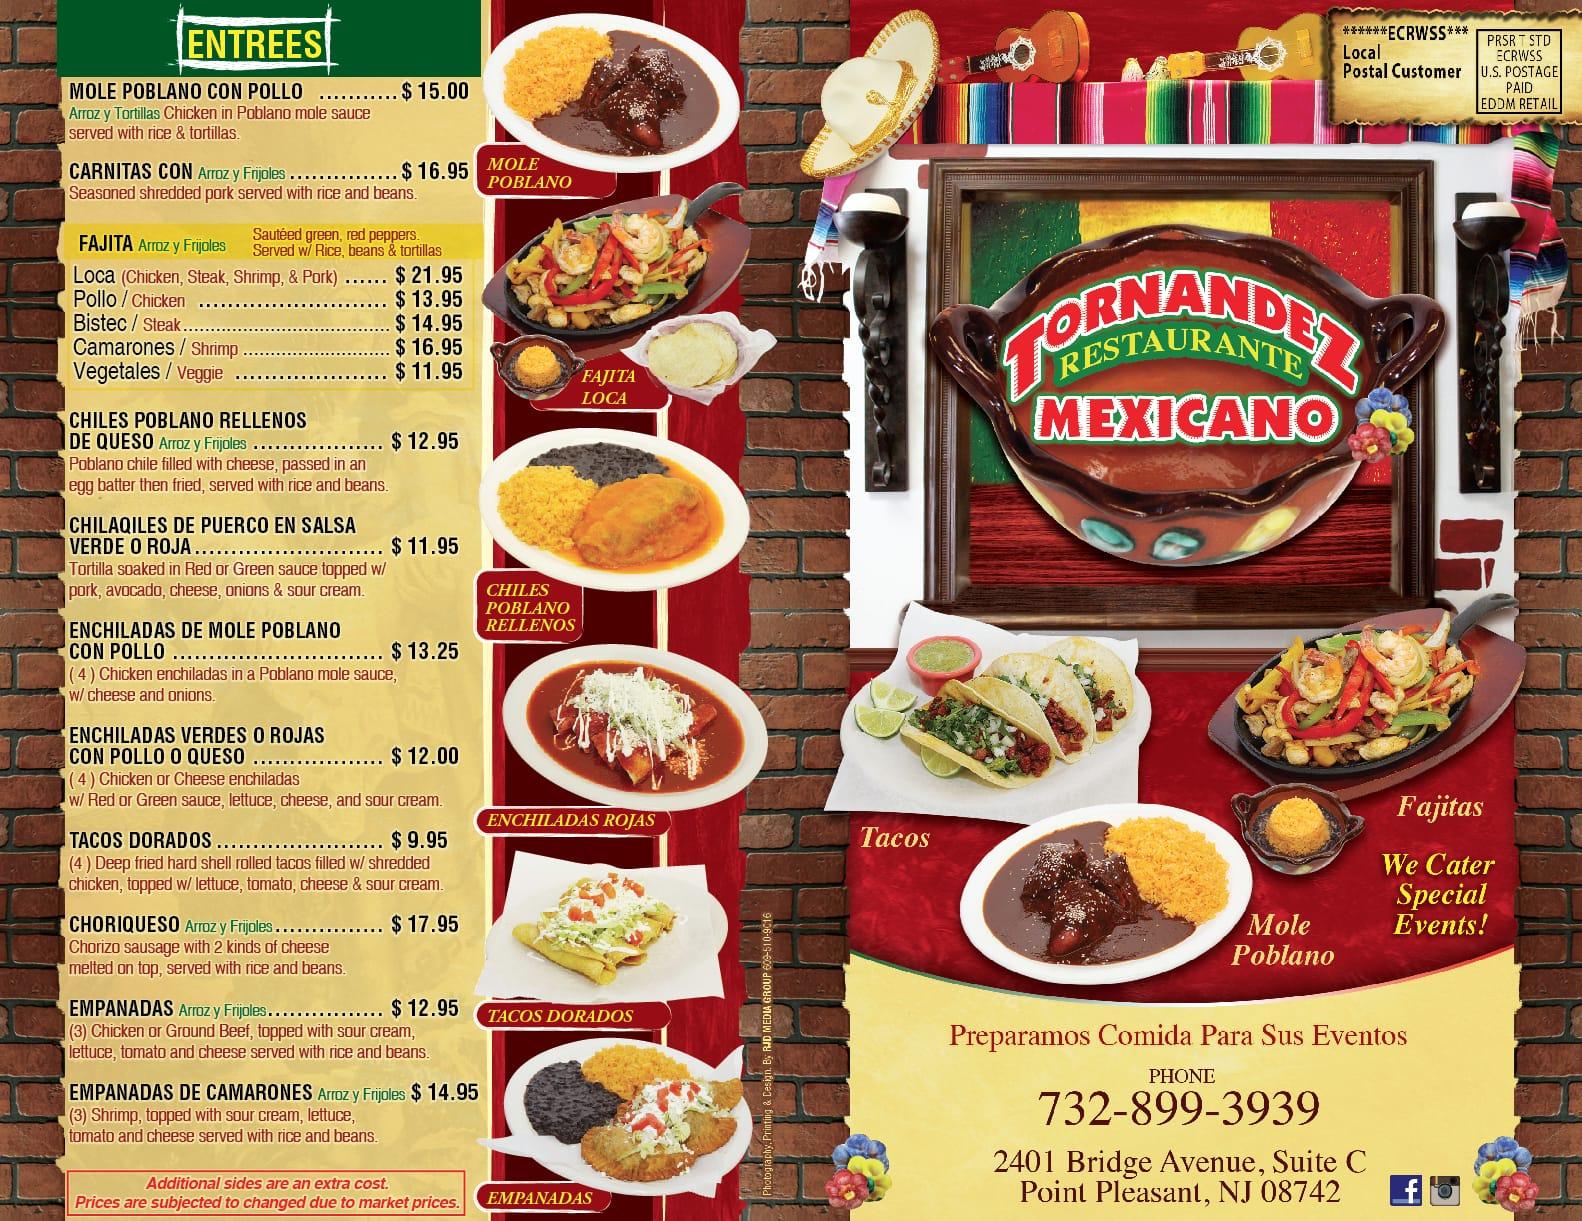 Tornandez Restaurante Mexicano Menu